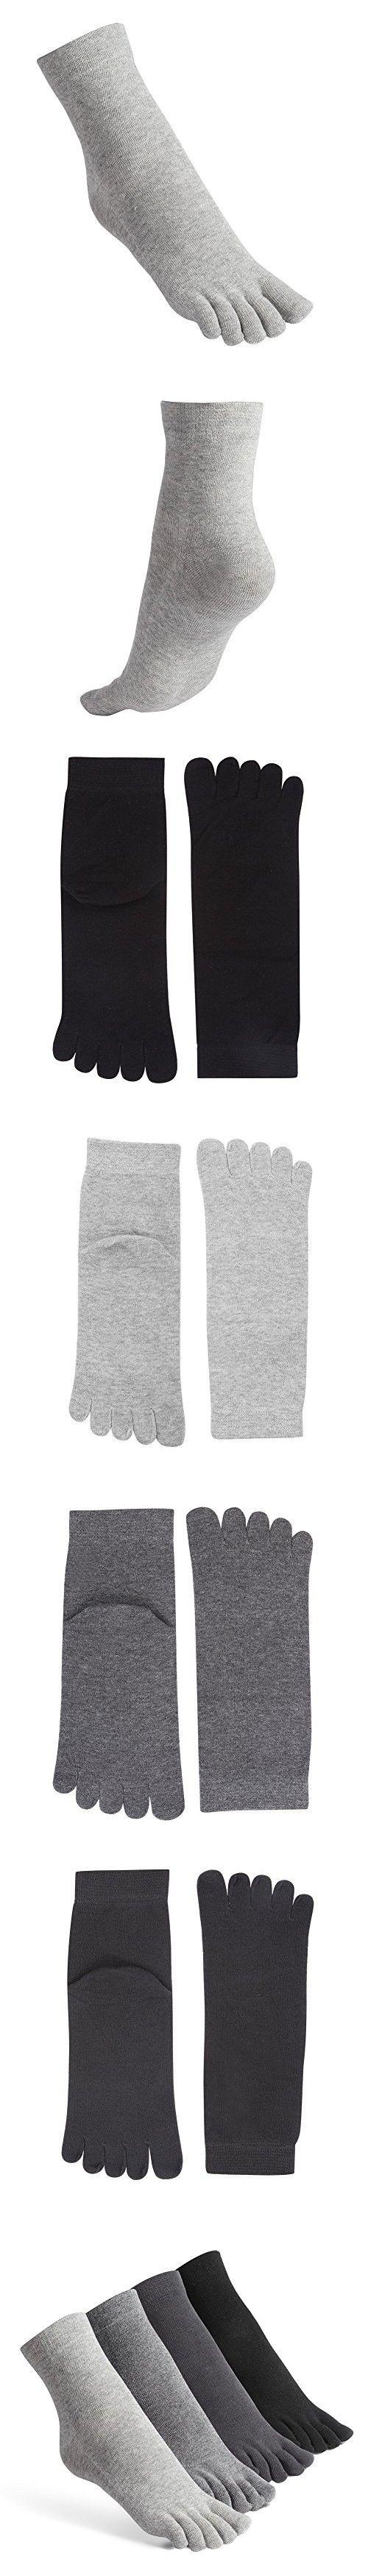 72 besten toe socks Bilder auf Pinterest | Zehensocken, Strumpfhosen ...